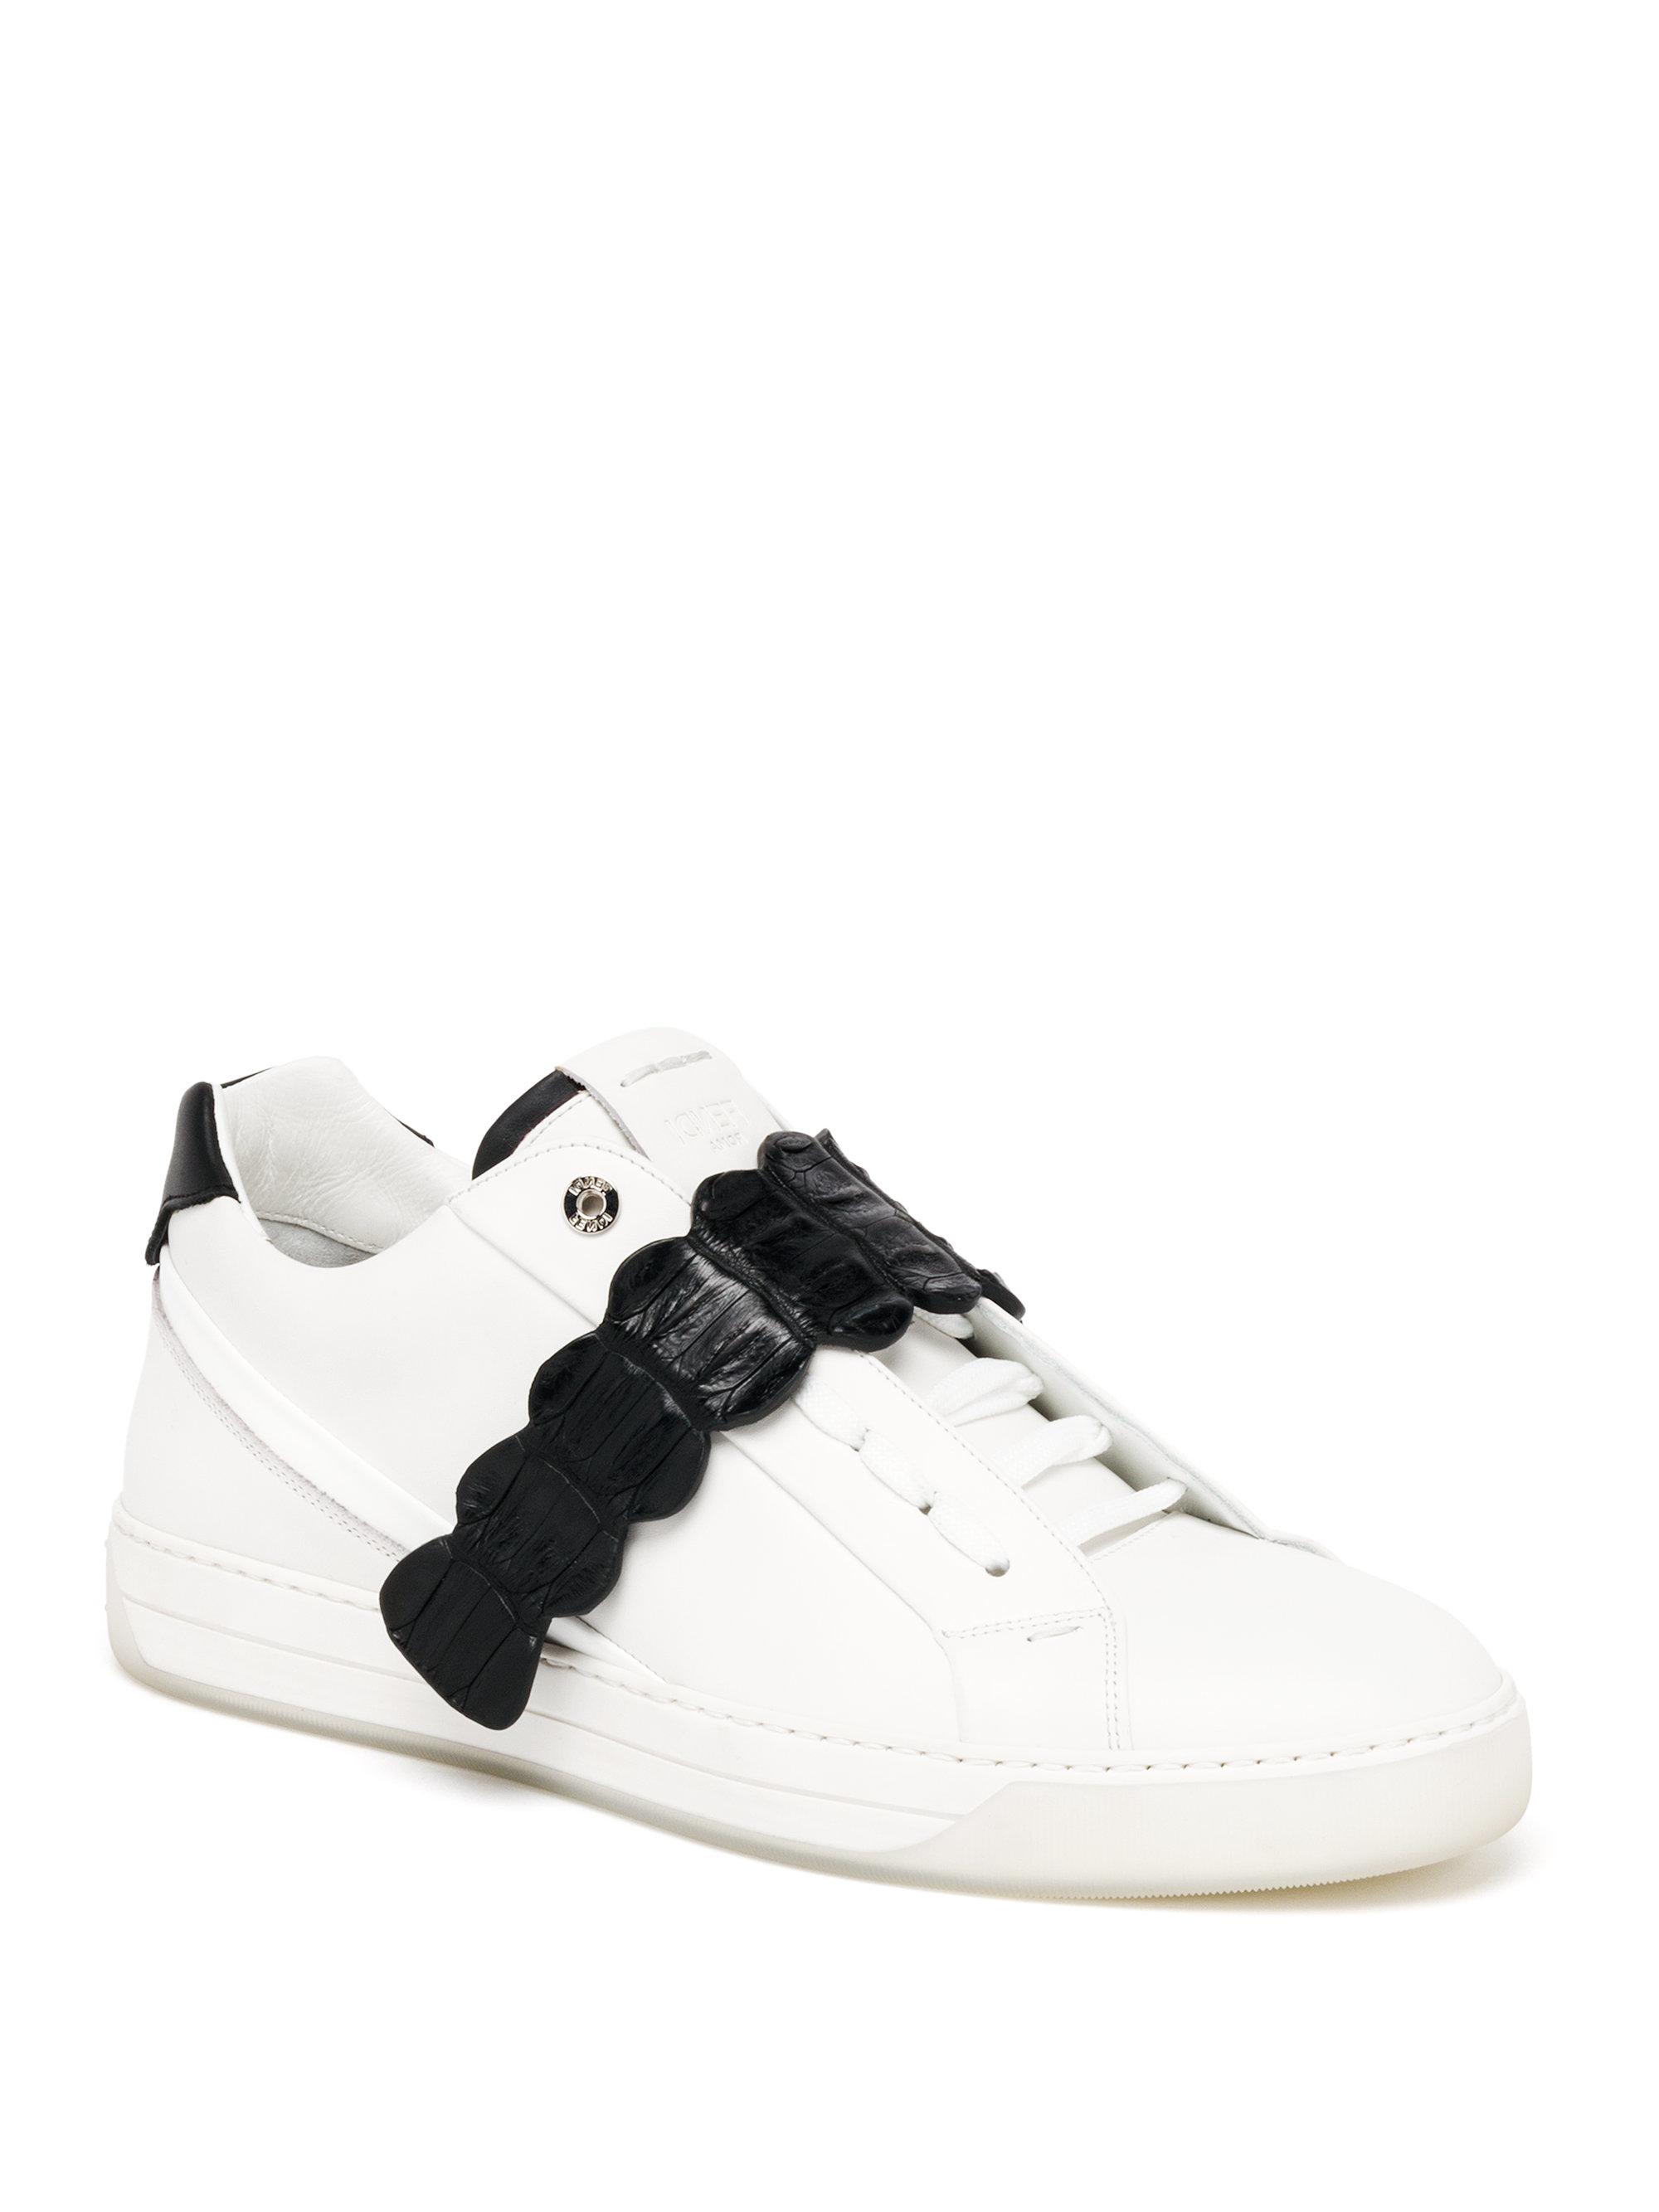 Fendi Textured Leather Sneakers ZWlsE